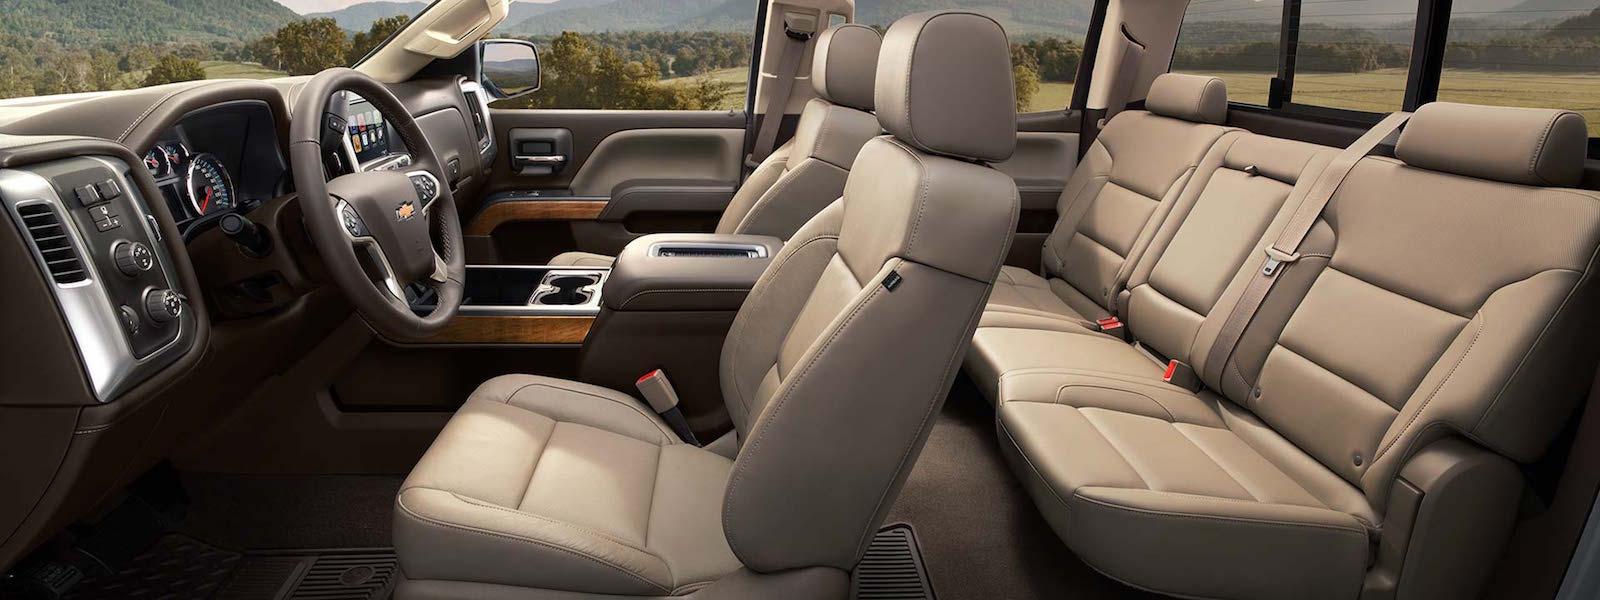 2016 Chevy Silverado 2500HD Safety